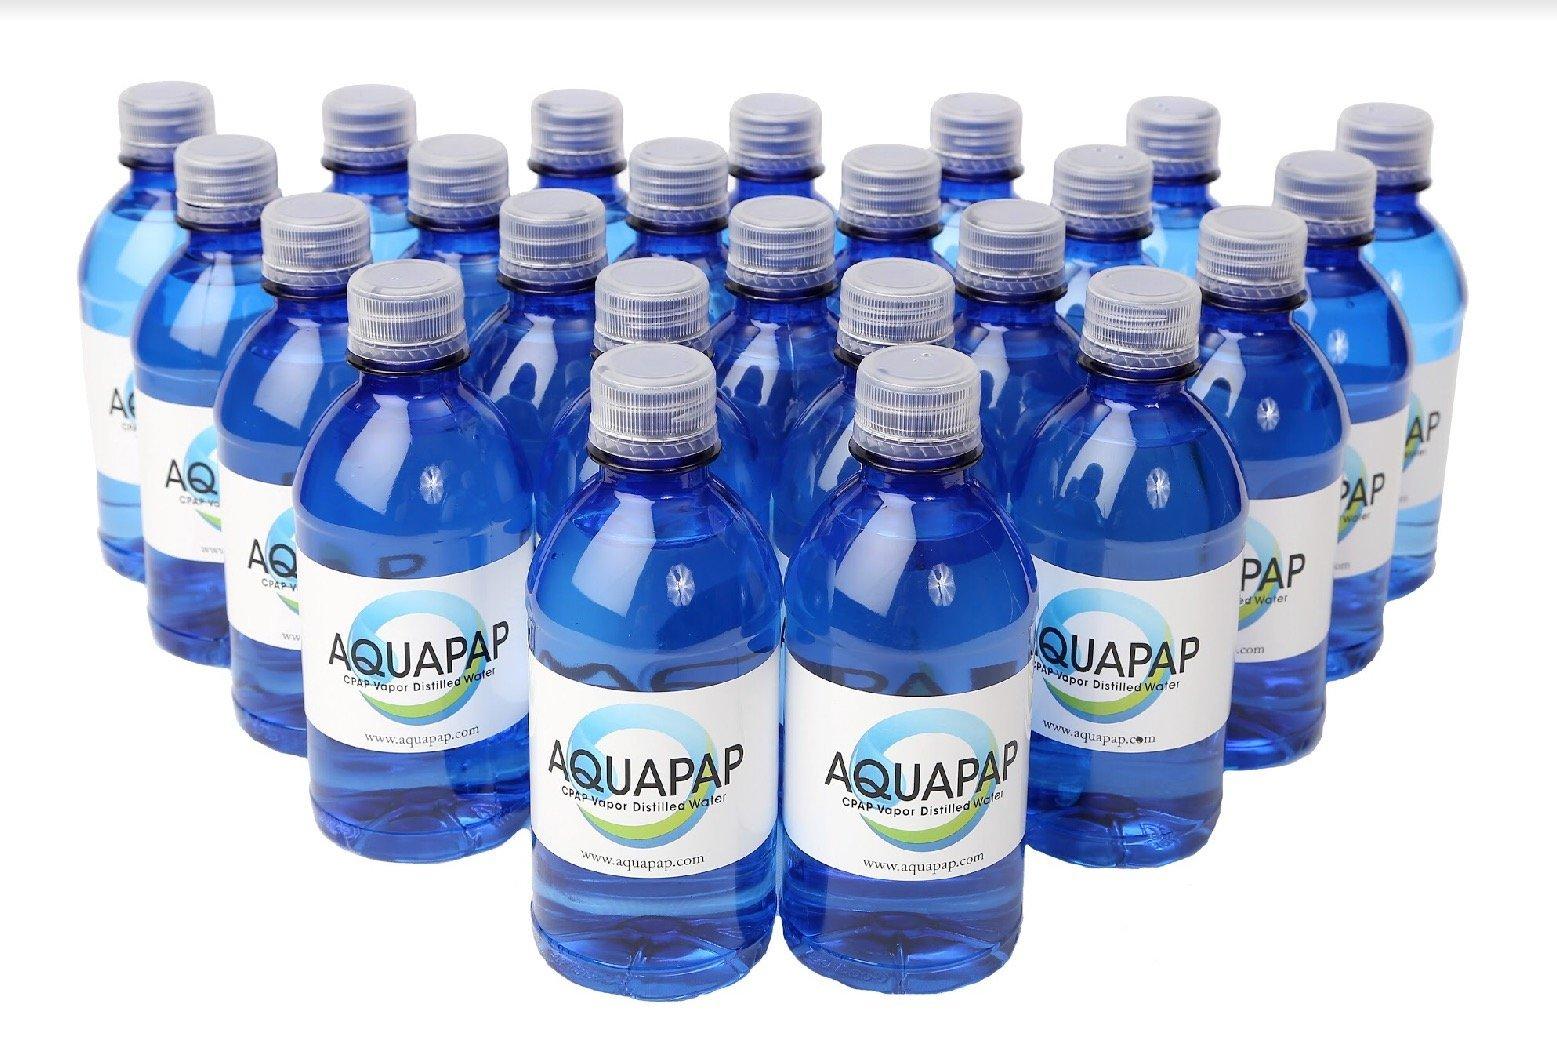 Aquapap Vapor Distilled Water Case of 24 x 12 oz bottles by Aquapap